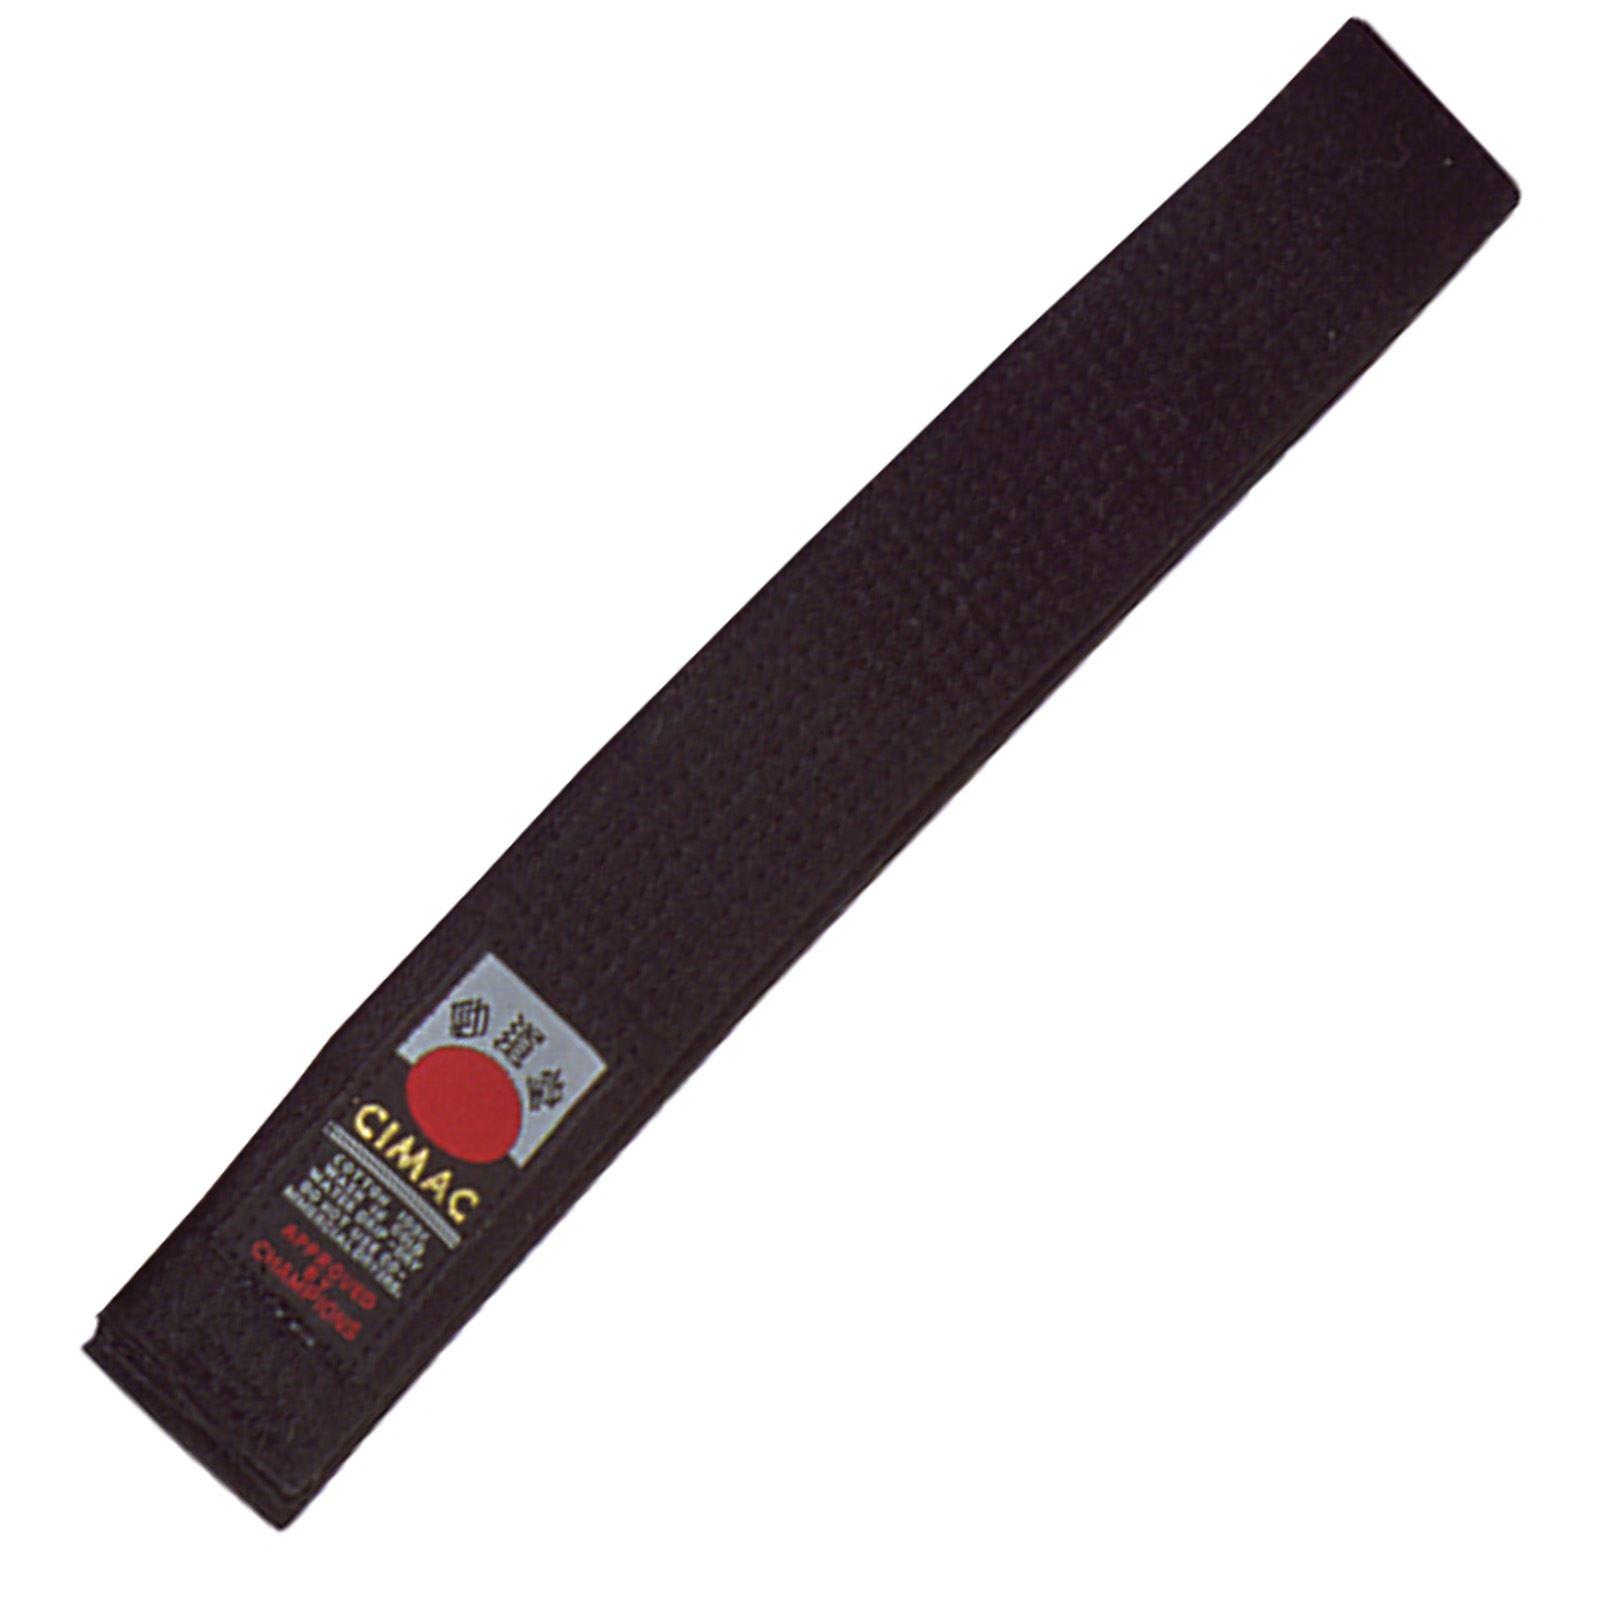 Cimac-Judo-Karate-Taekwondo-Plain-Coloured-Martial-Arts-Belt-UniformVarious-Size thumbnail 4